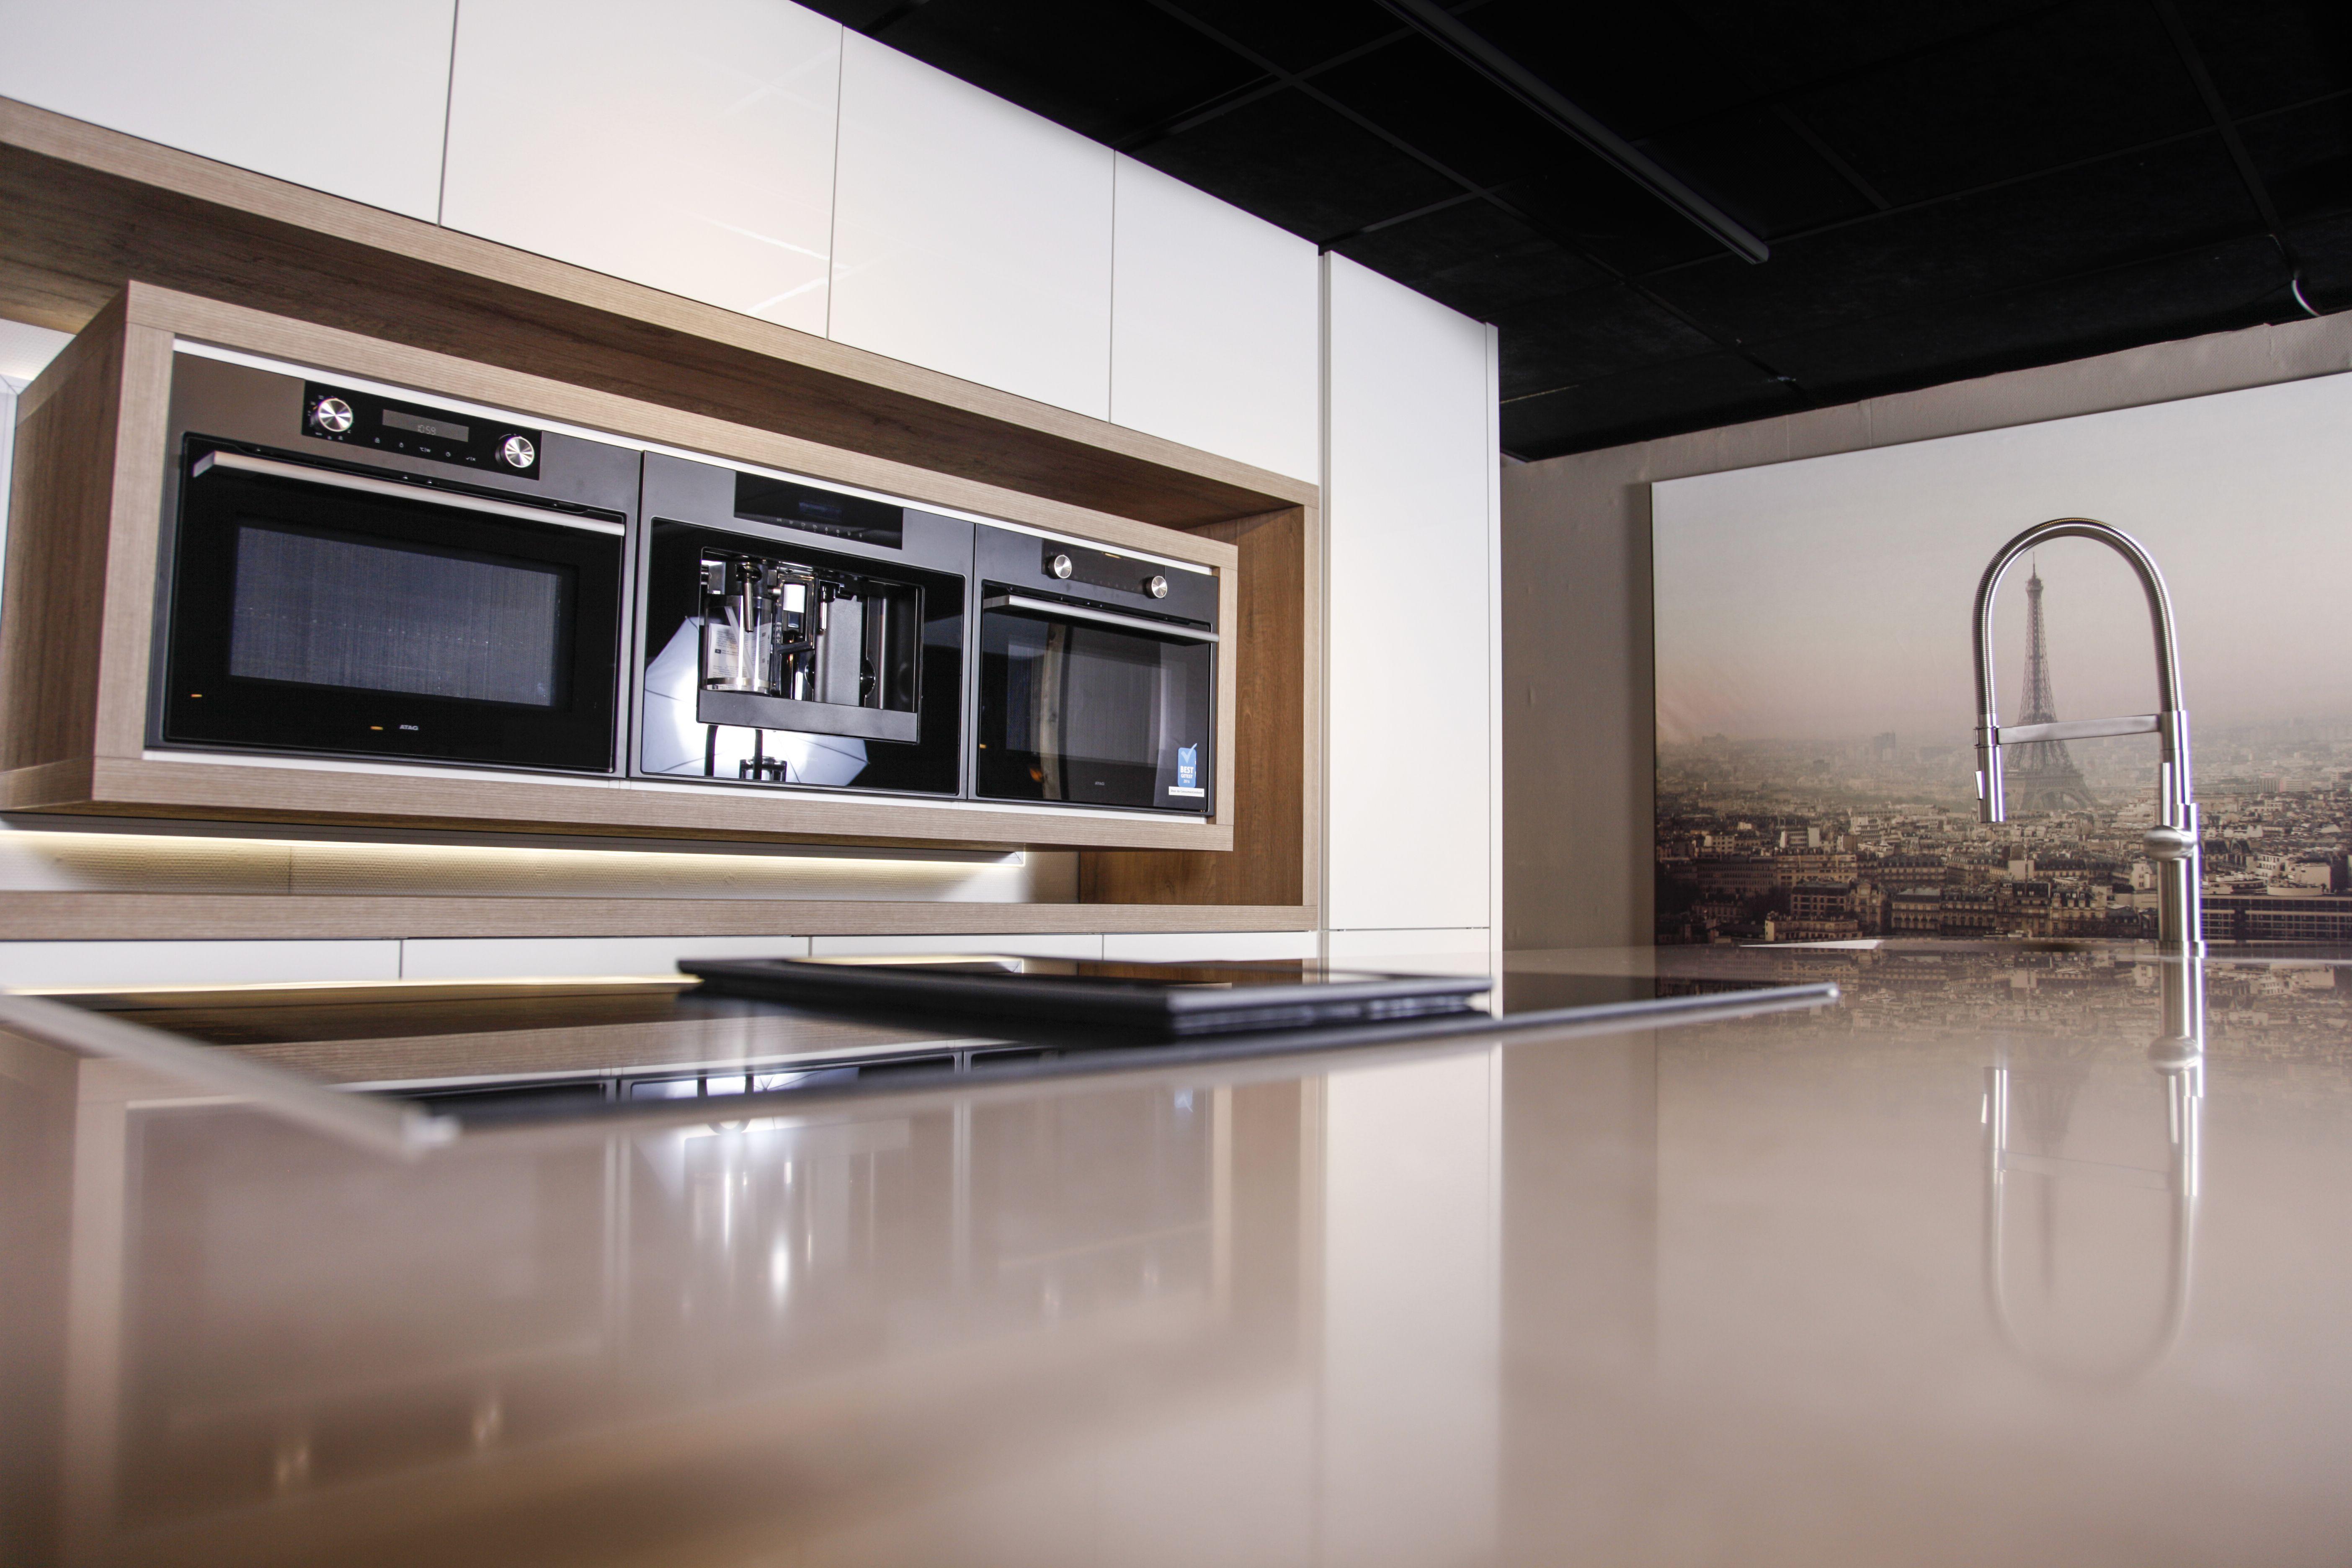 Moderne Hoogglans Keuken : Moderne hoogglans keuken met de nieuwste atag apparatuur moderne